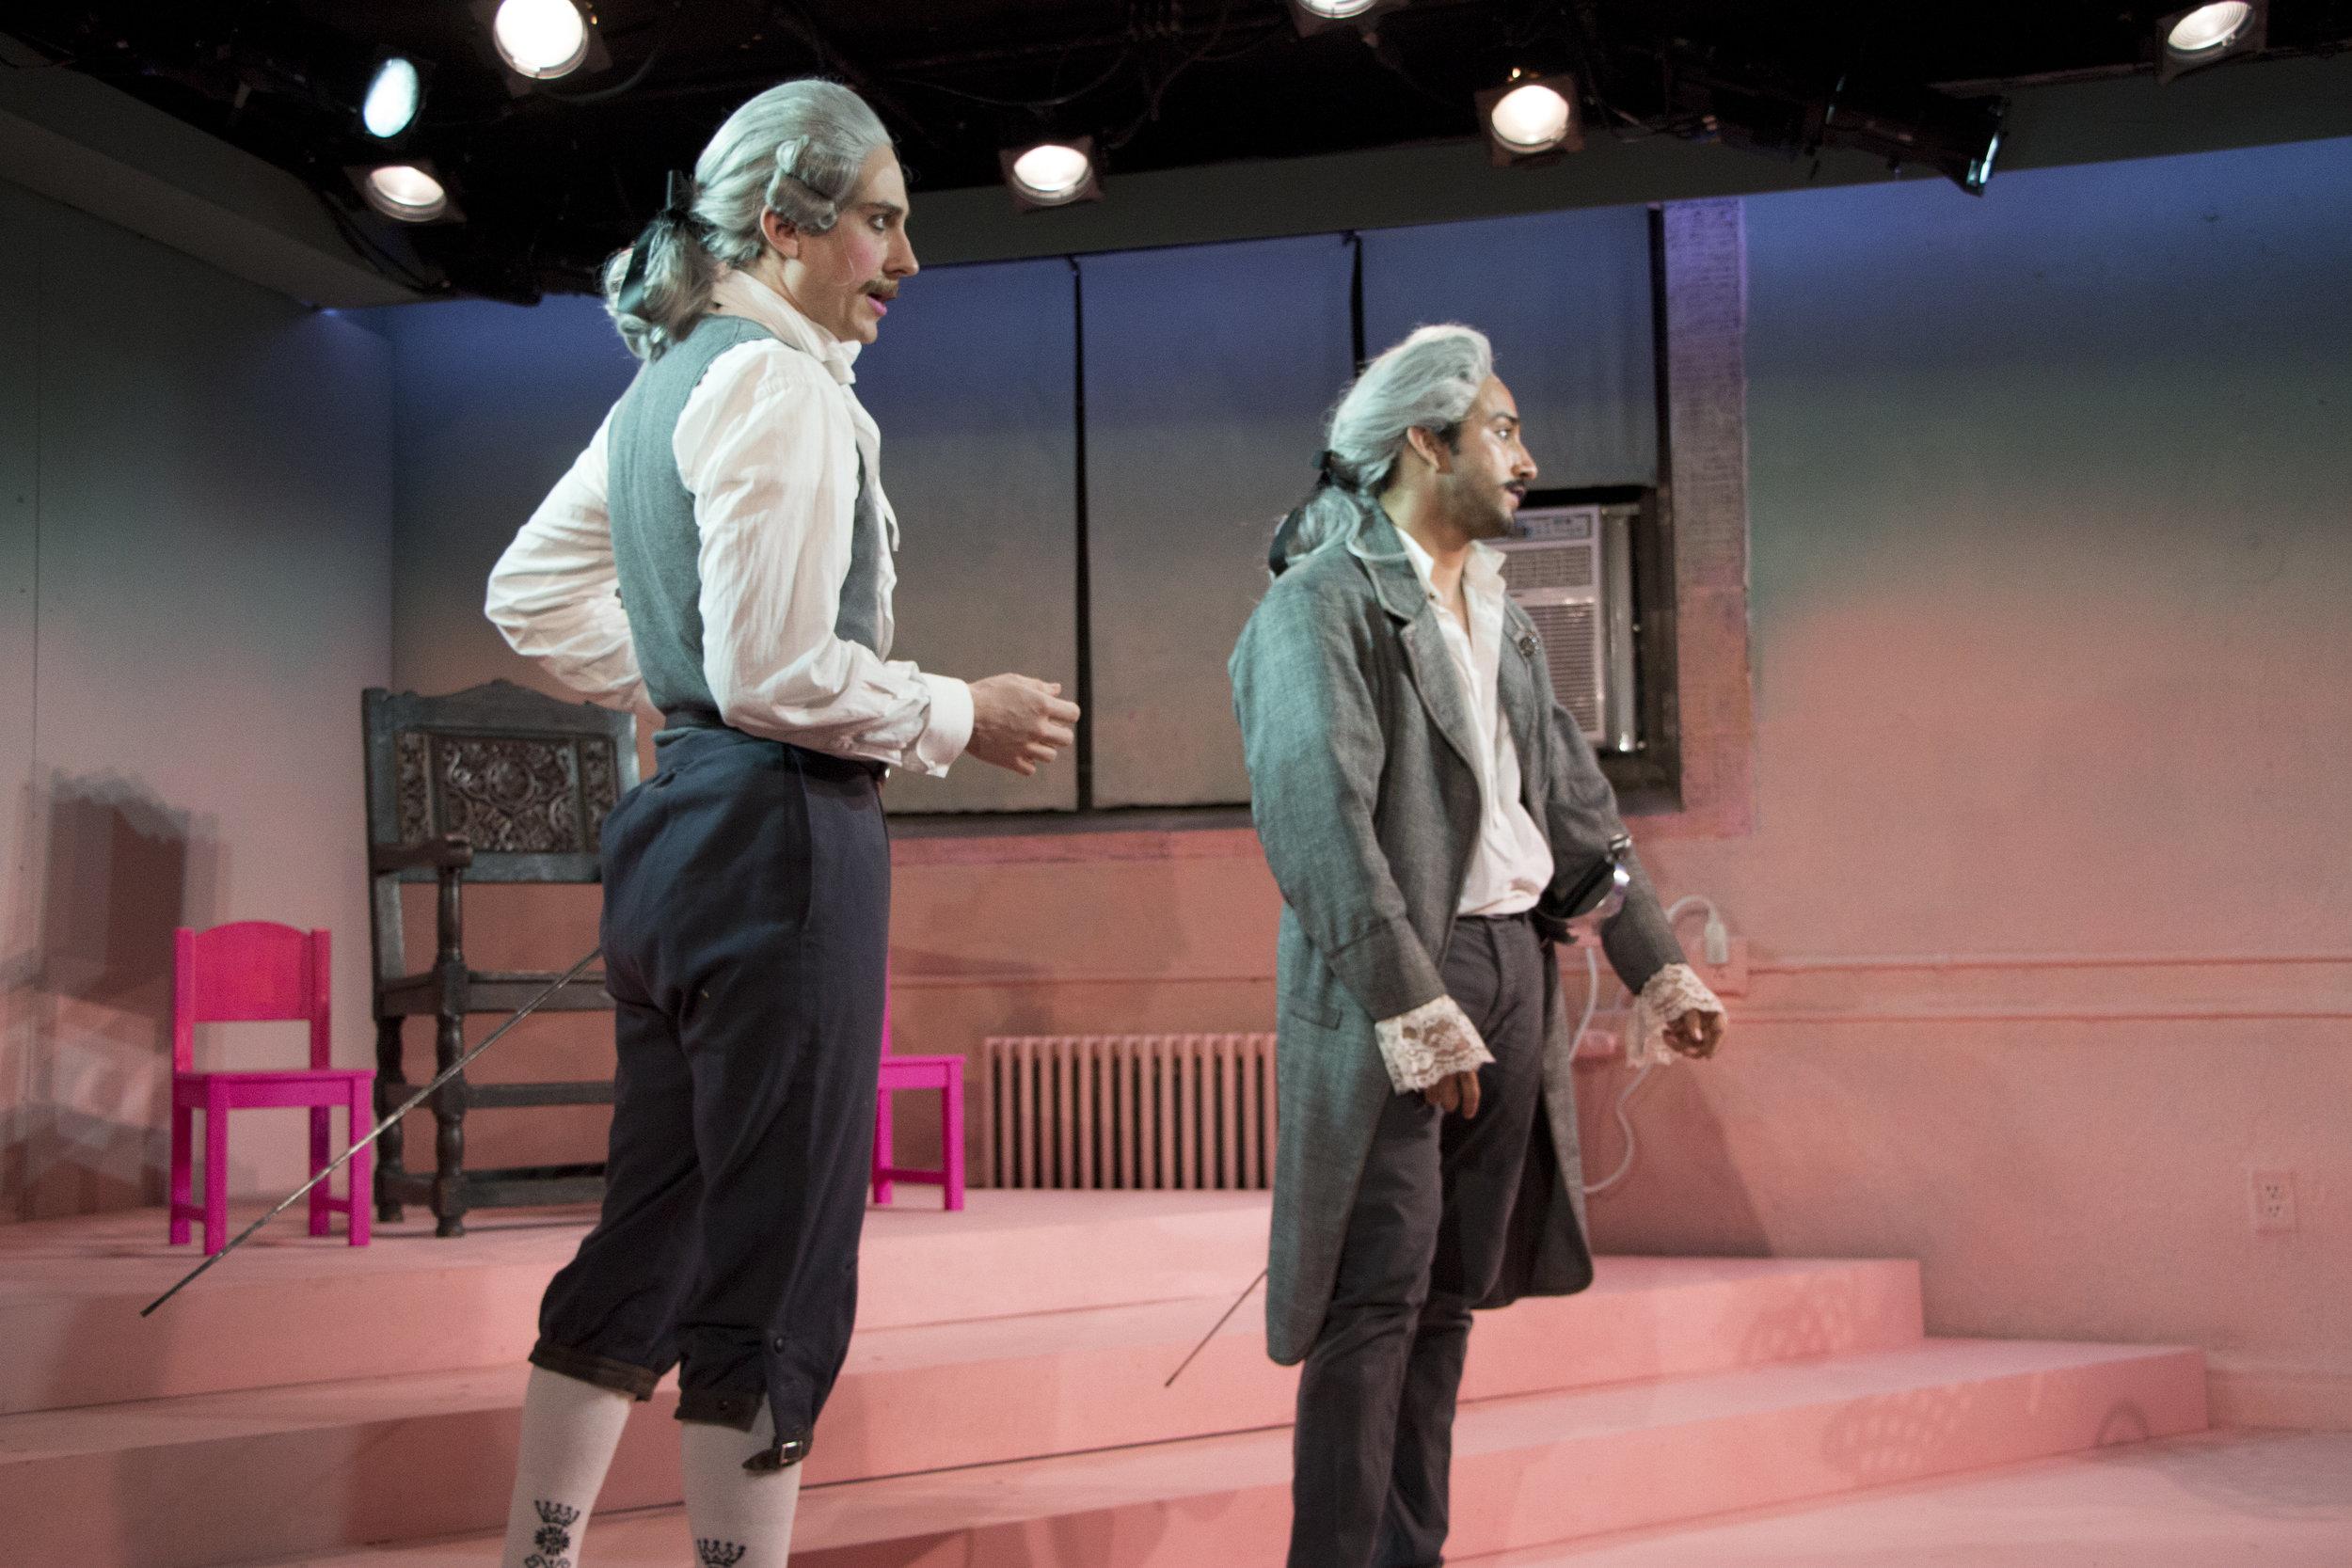 Stephen Cefalu as EDGAR, Jake Lozano as EDMUND